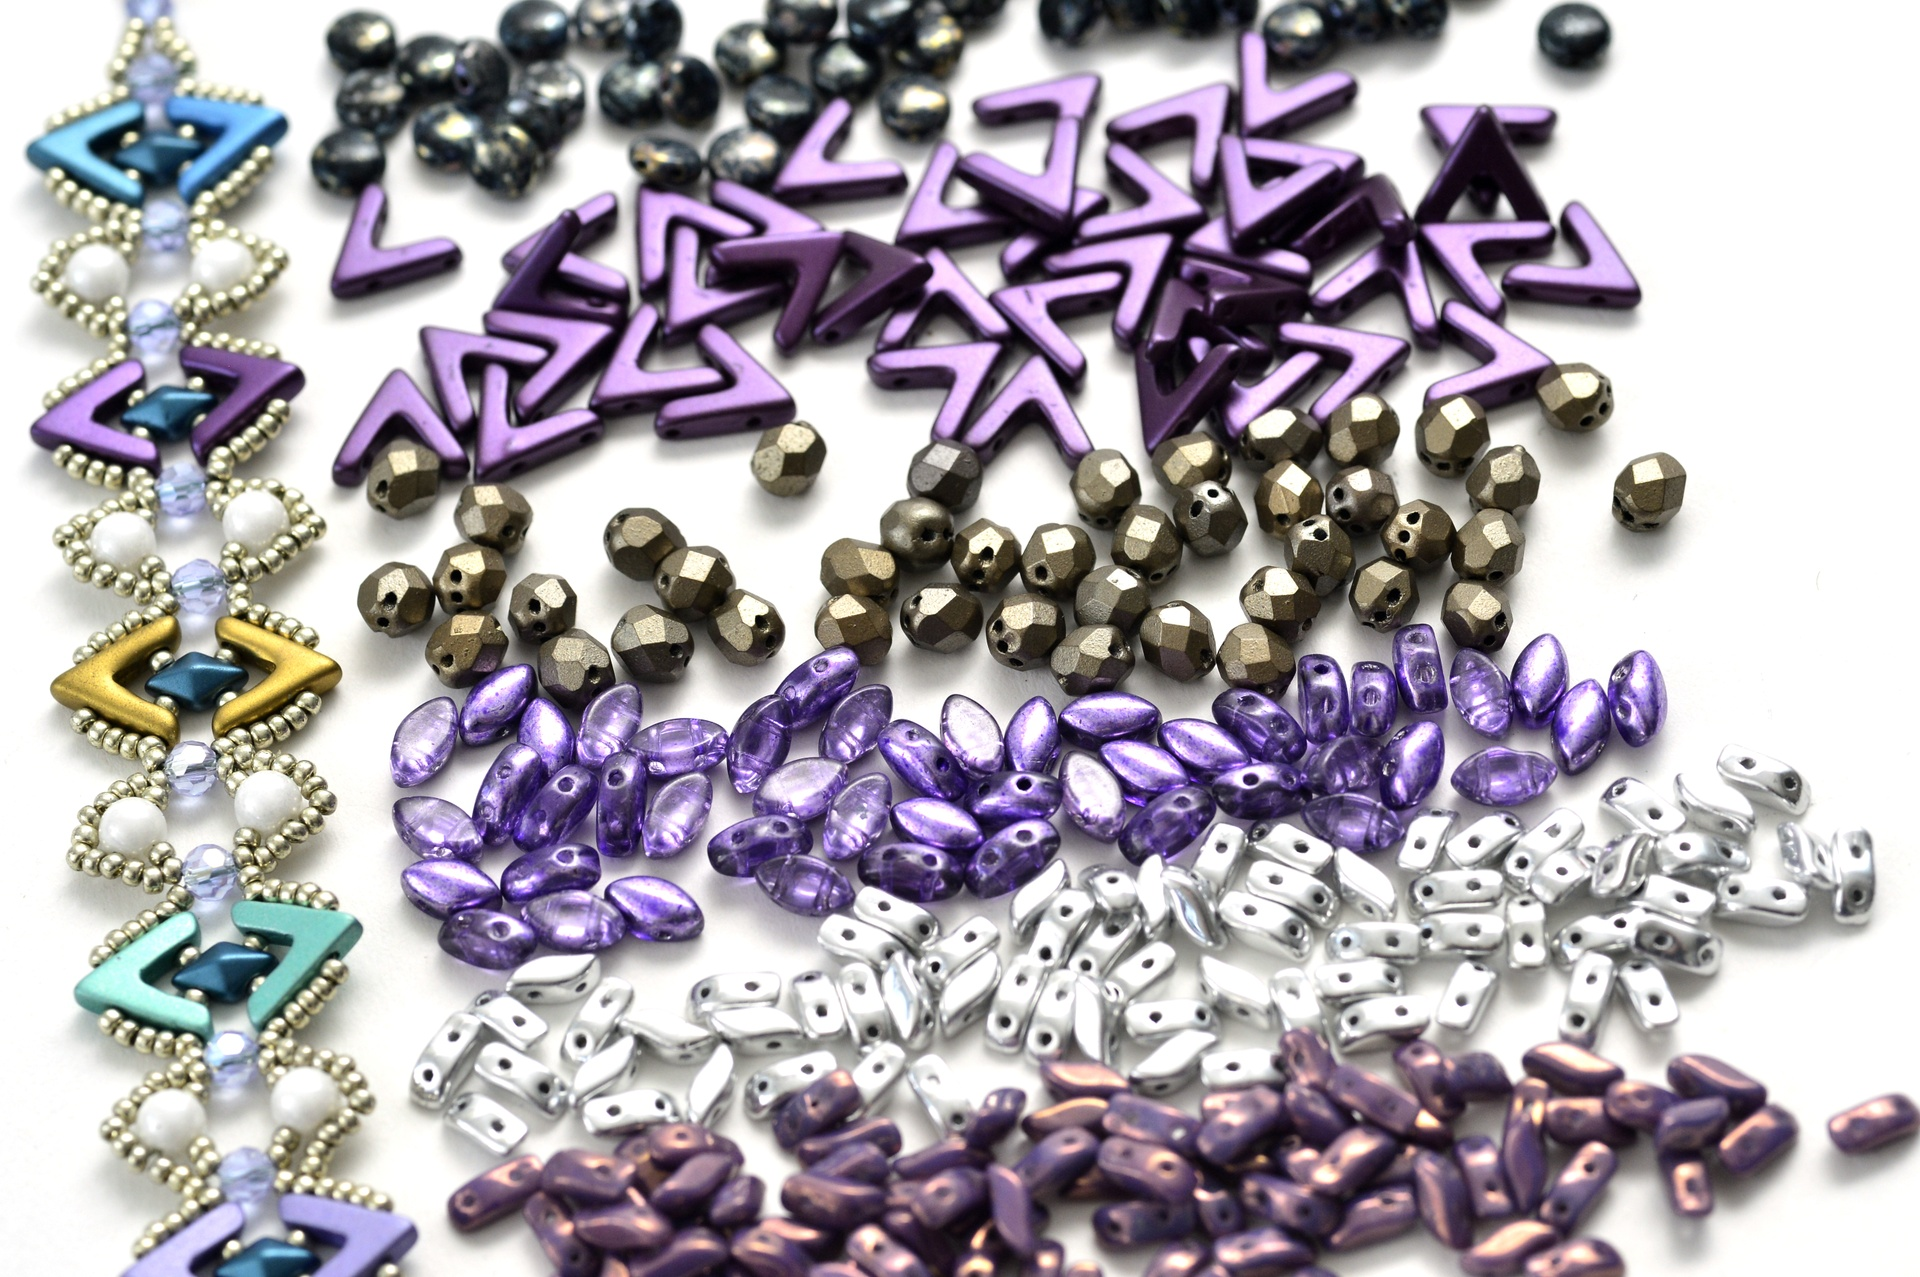 Czech Pressed Glass Beads